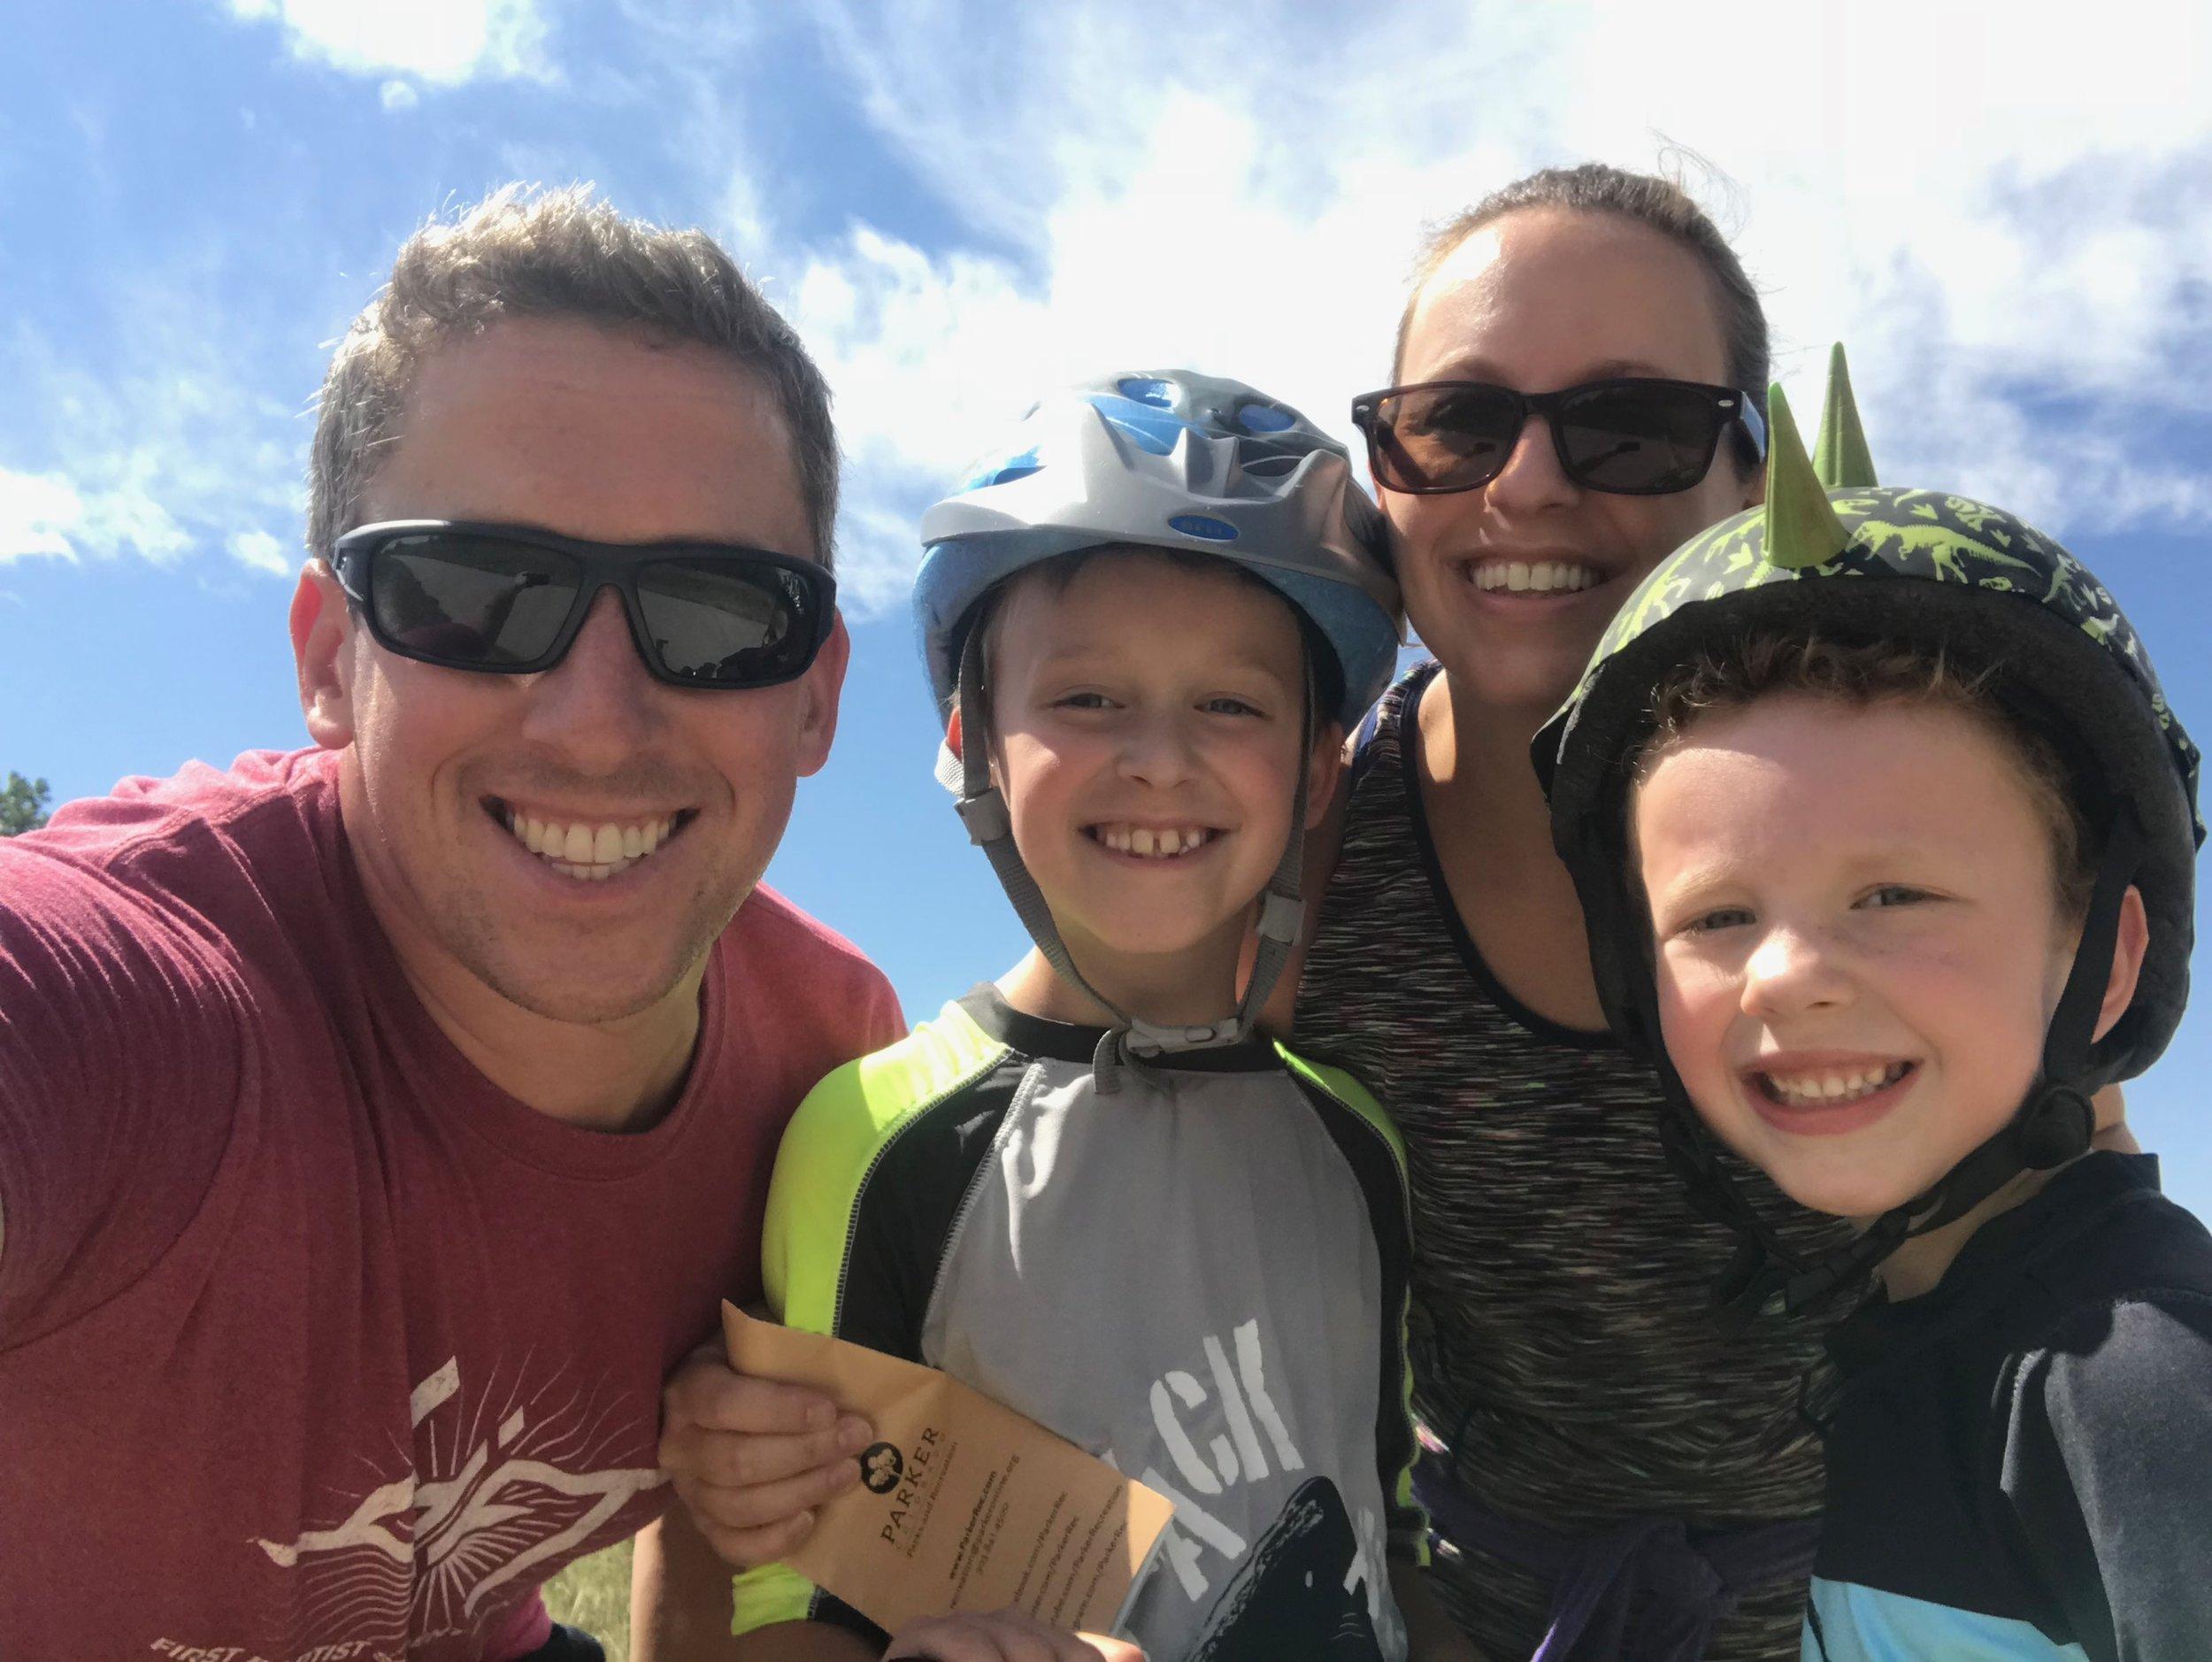 Family Biking pic.jpeg